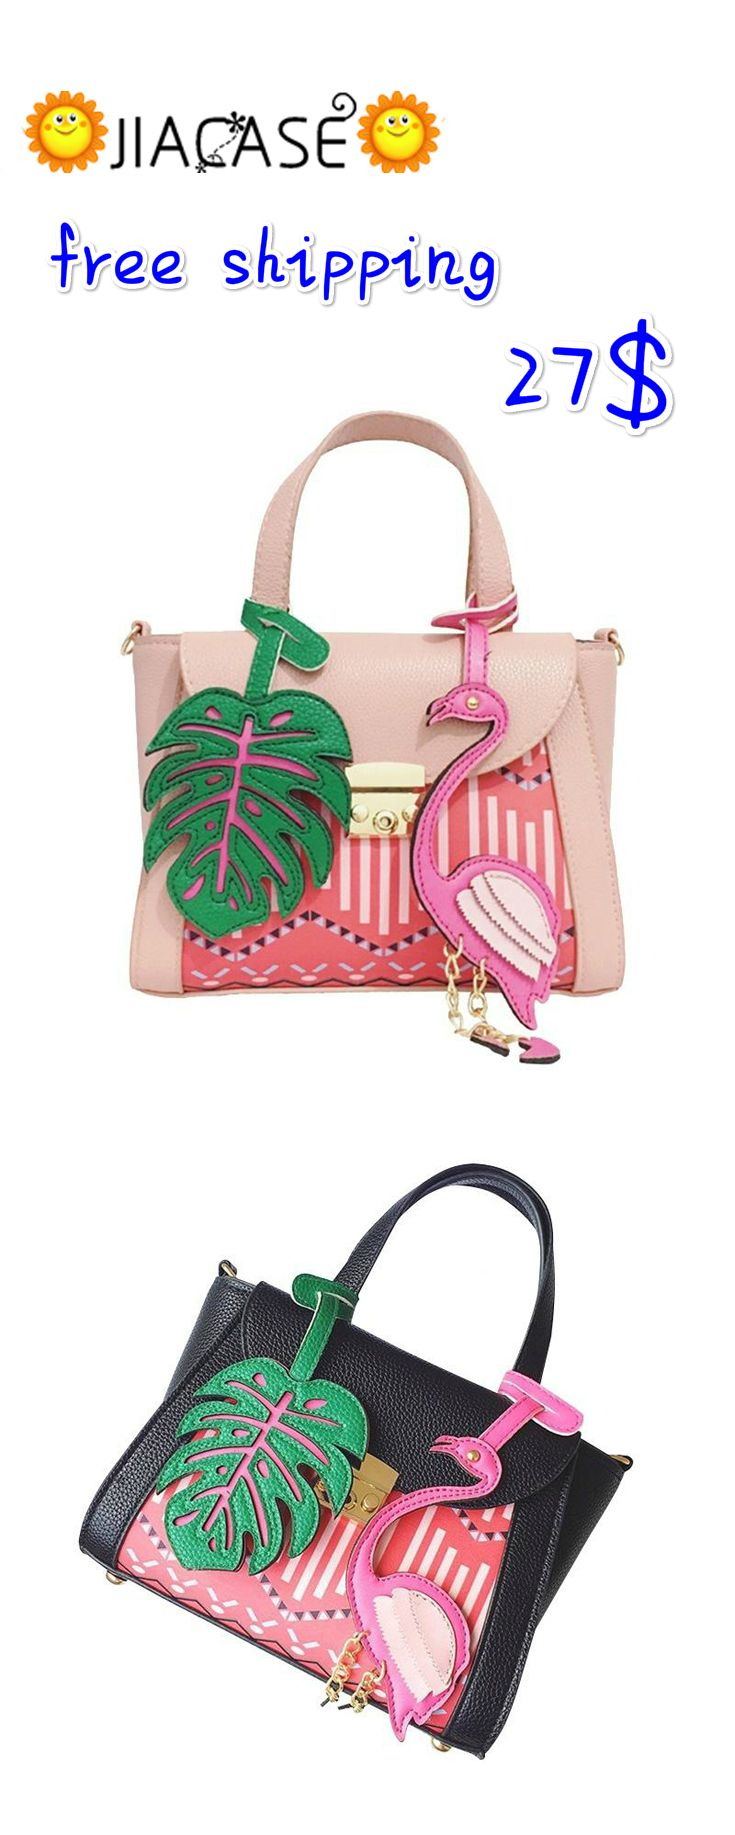 Brand #Floral #Bird #Cartoon Printing #Bag Women #Shoulder Bags Designer #Handbags Girls #Tote Female #Leather #Messenger #Bags